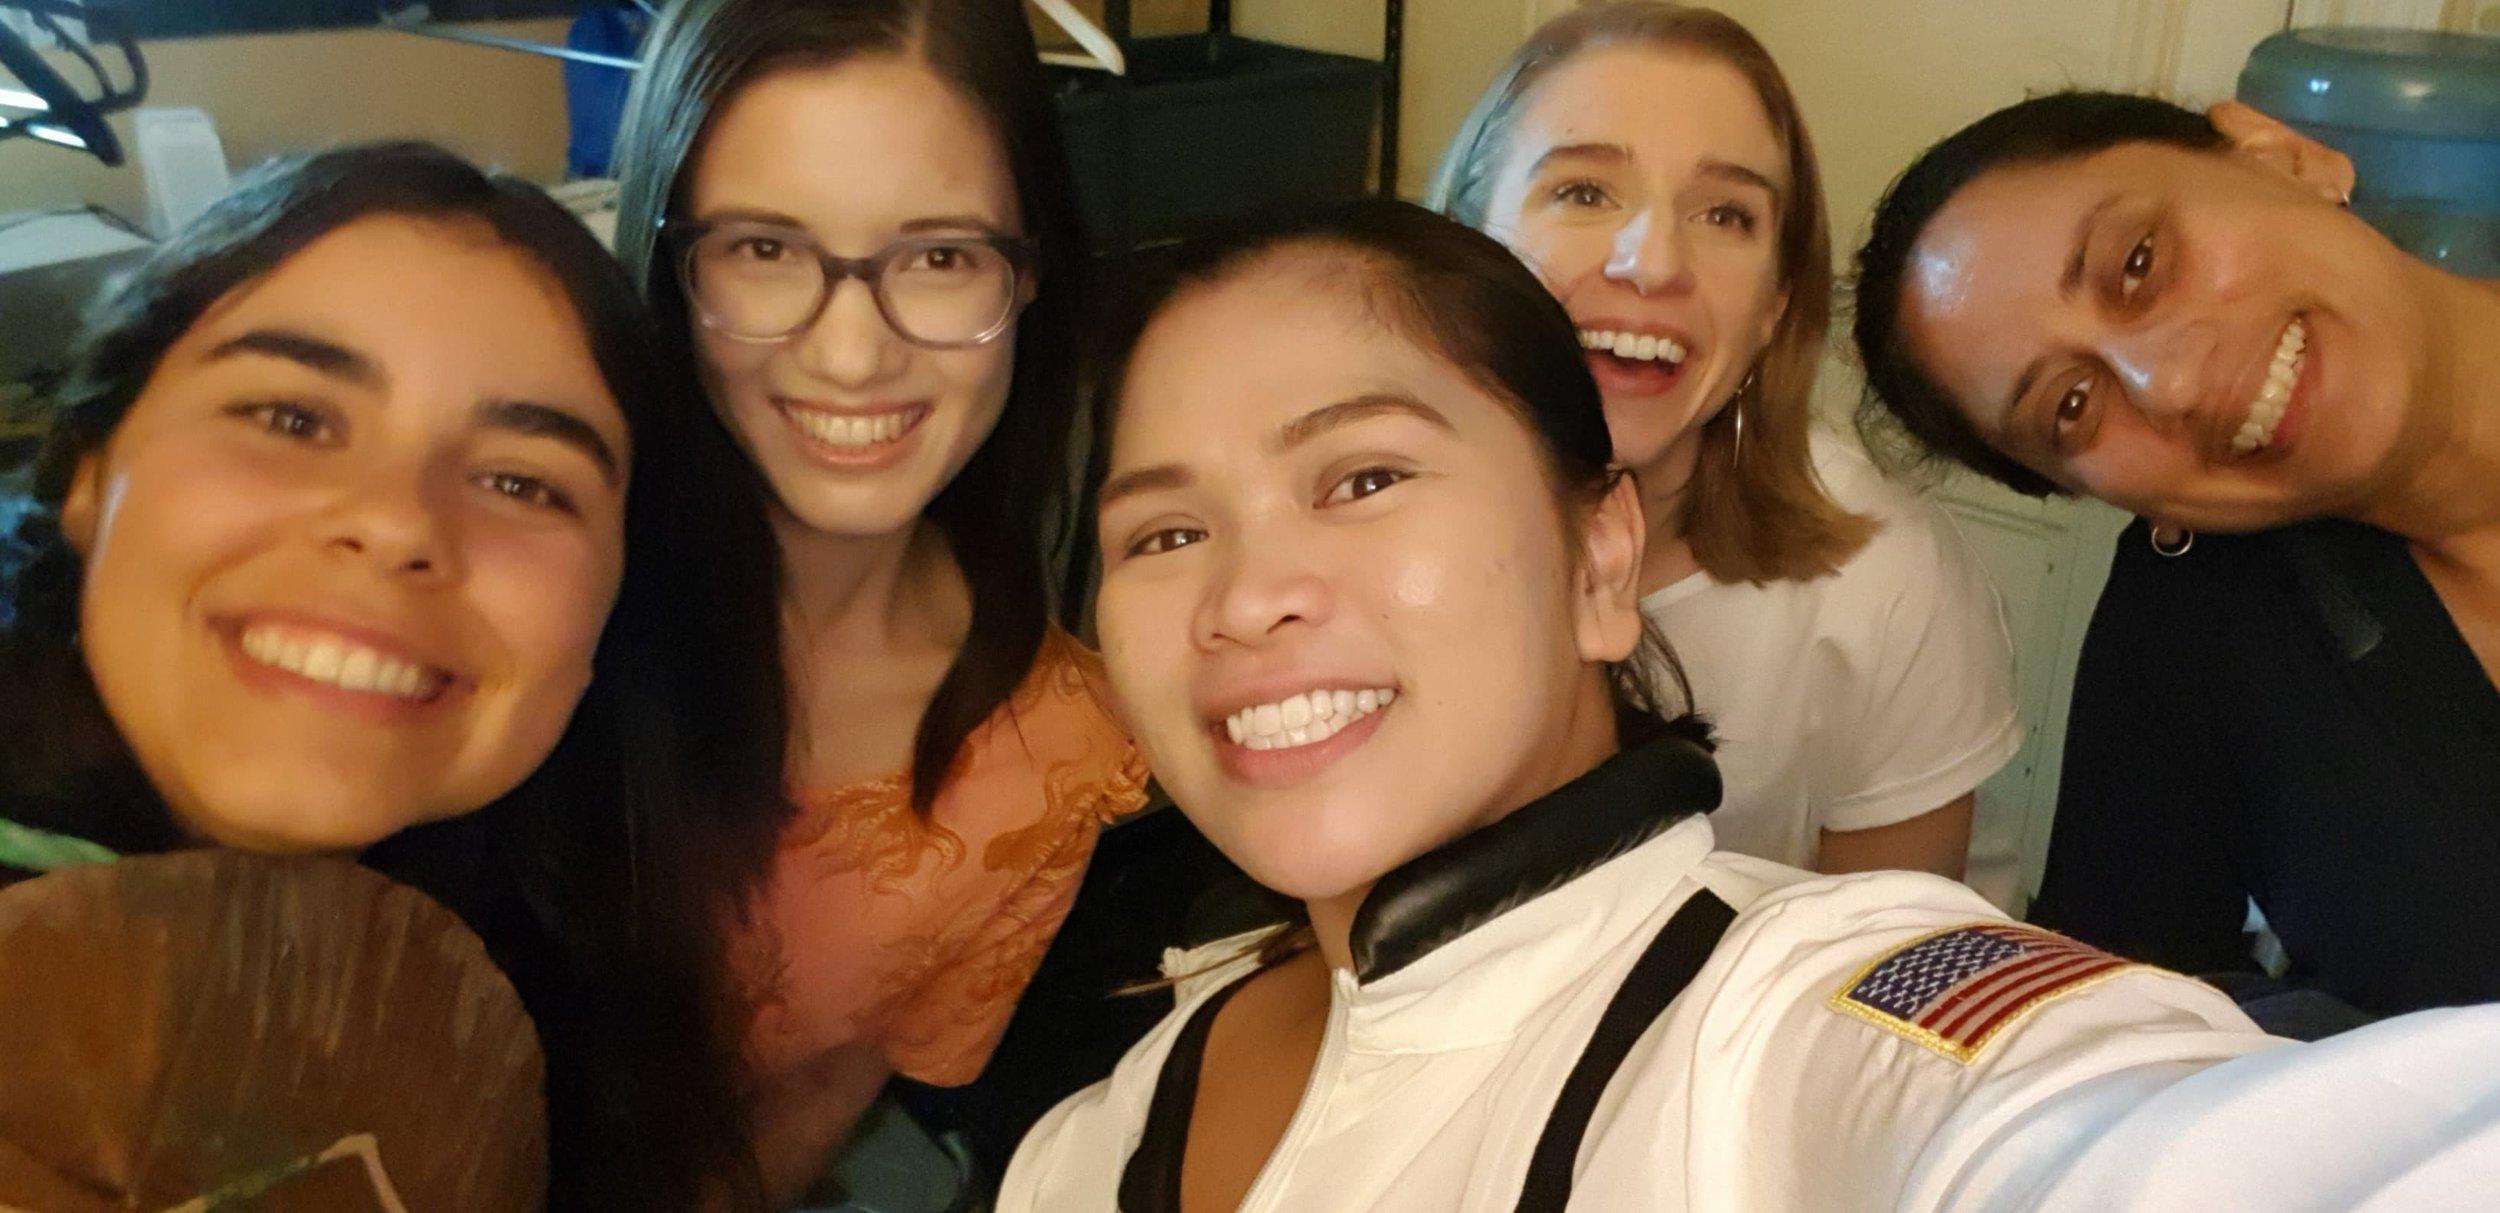 L-R: Lucia May, Tabitha Woo, Rizcel Gagawanan, Melissa Hume, Suz Mawer.